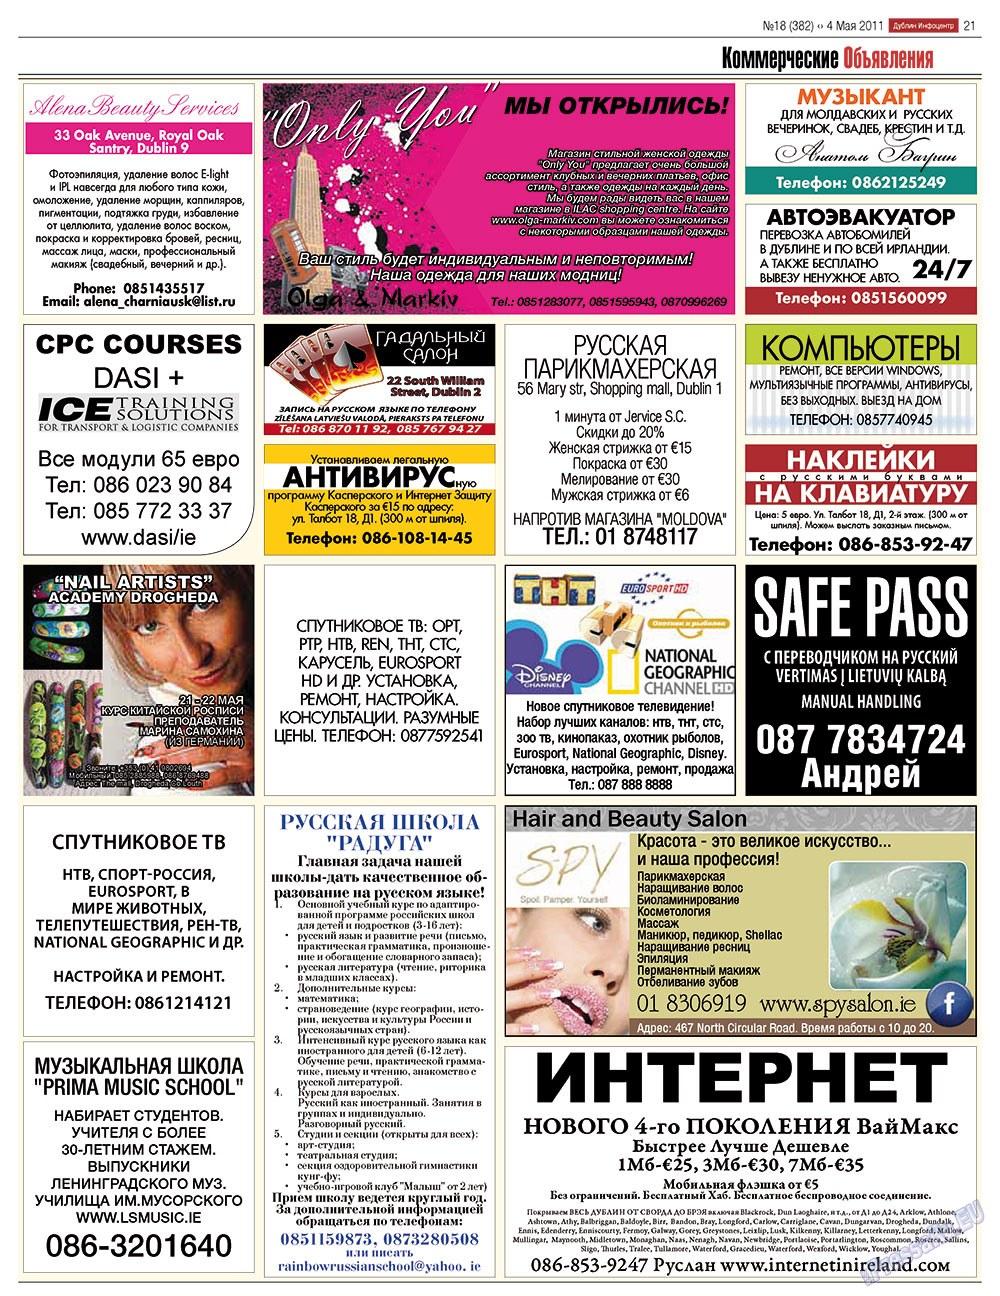 Дублин инфоцентр (газета). 2011 год, номер 18, стр. 21